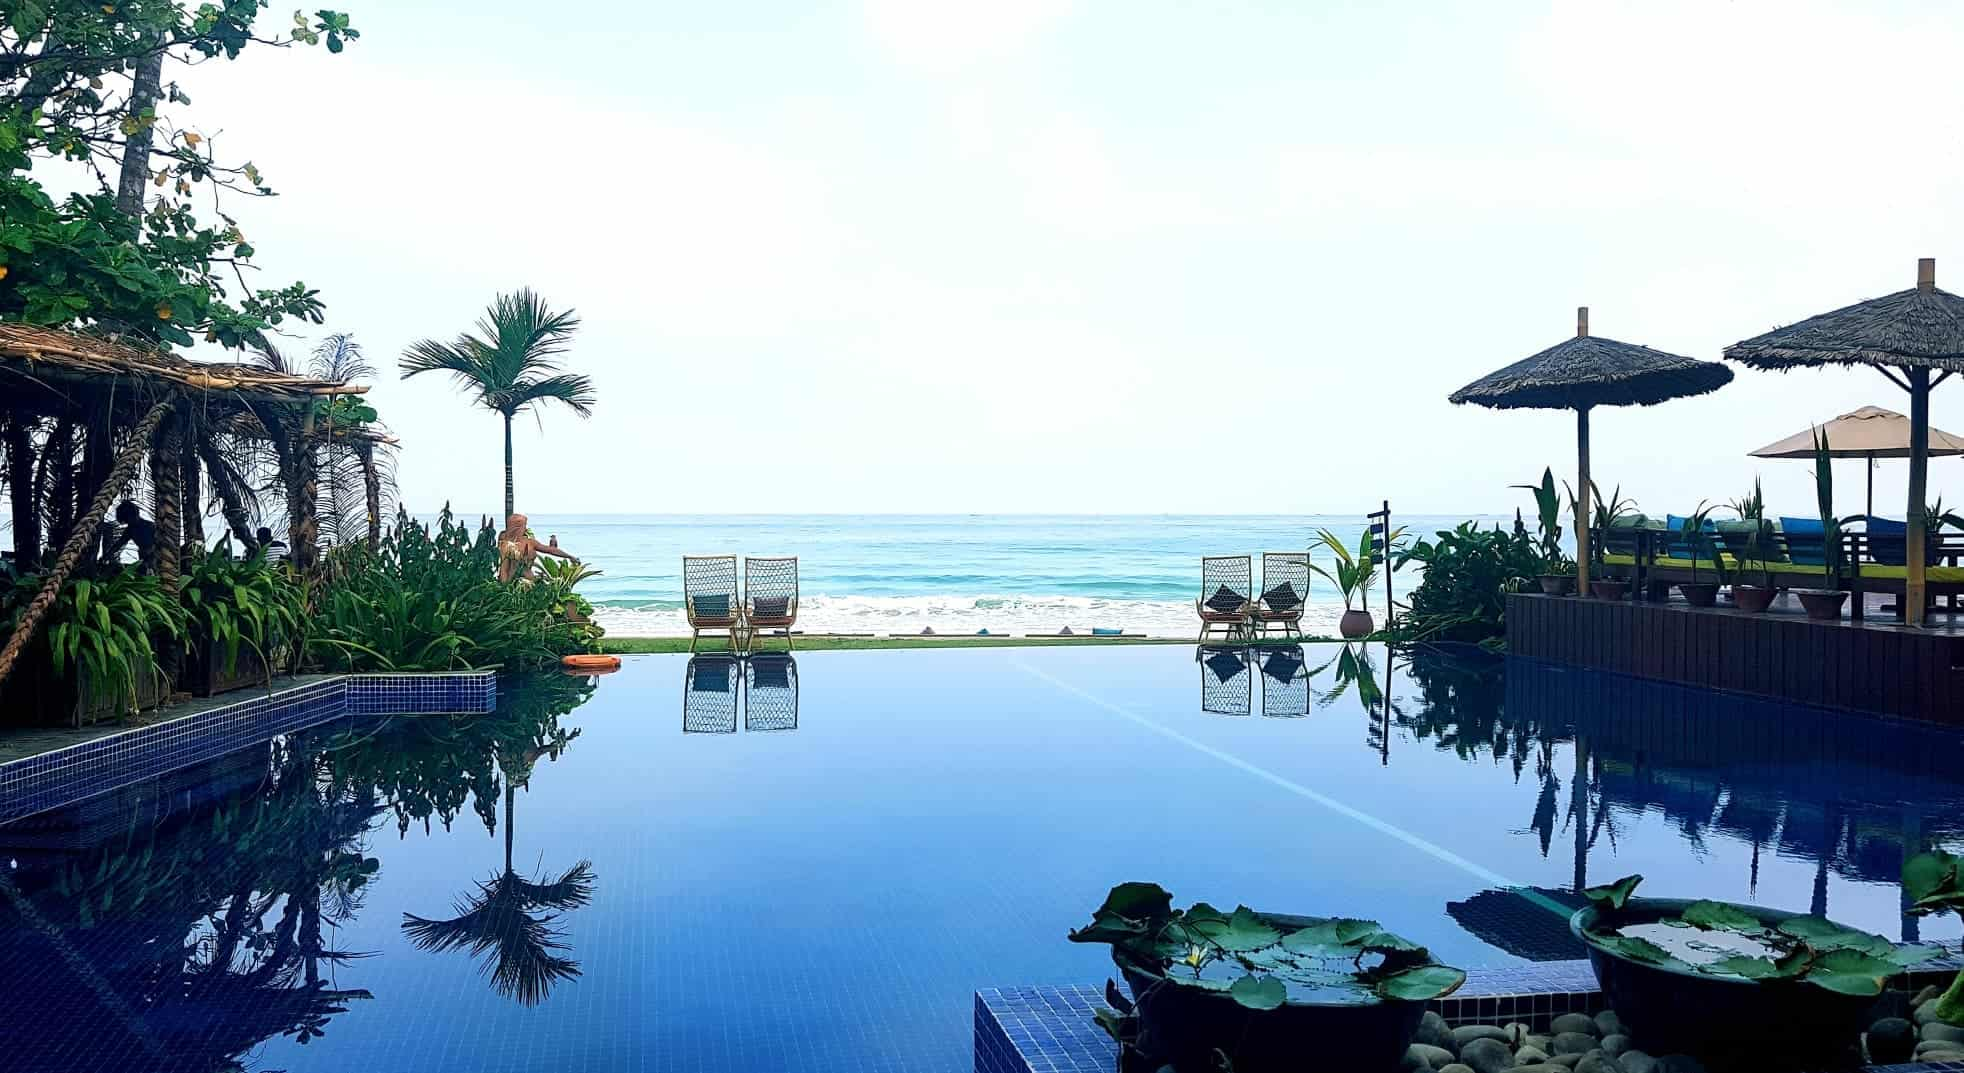 Oceanfront view and swimming pool at Amata Resort, Ngapali Beach, Myanmar.